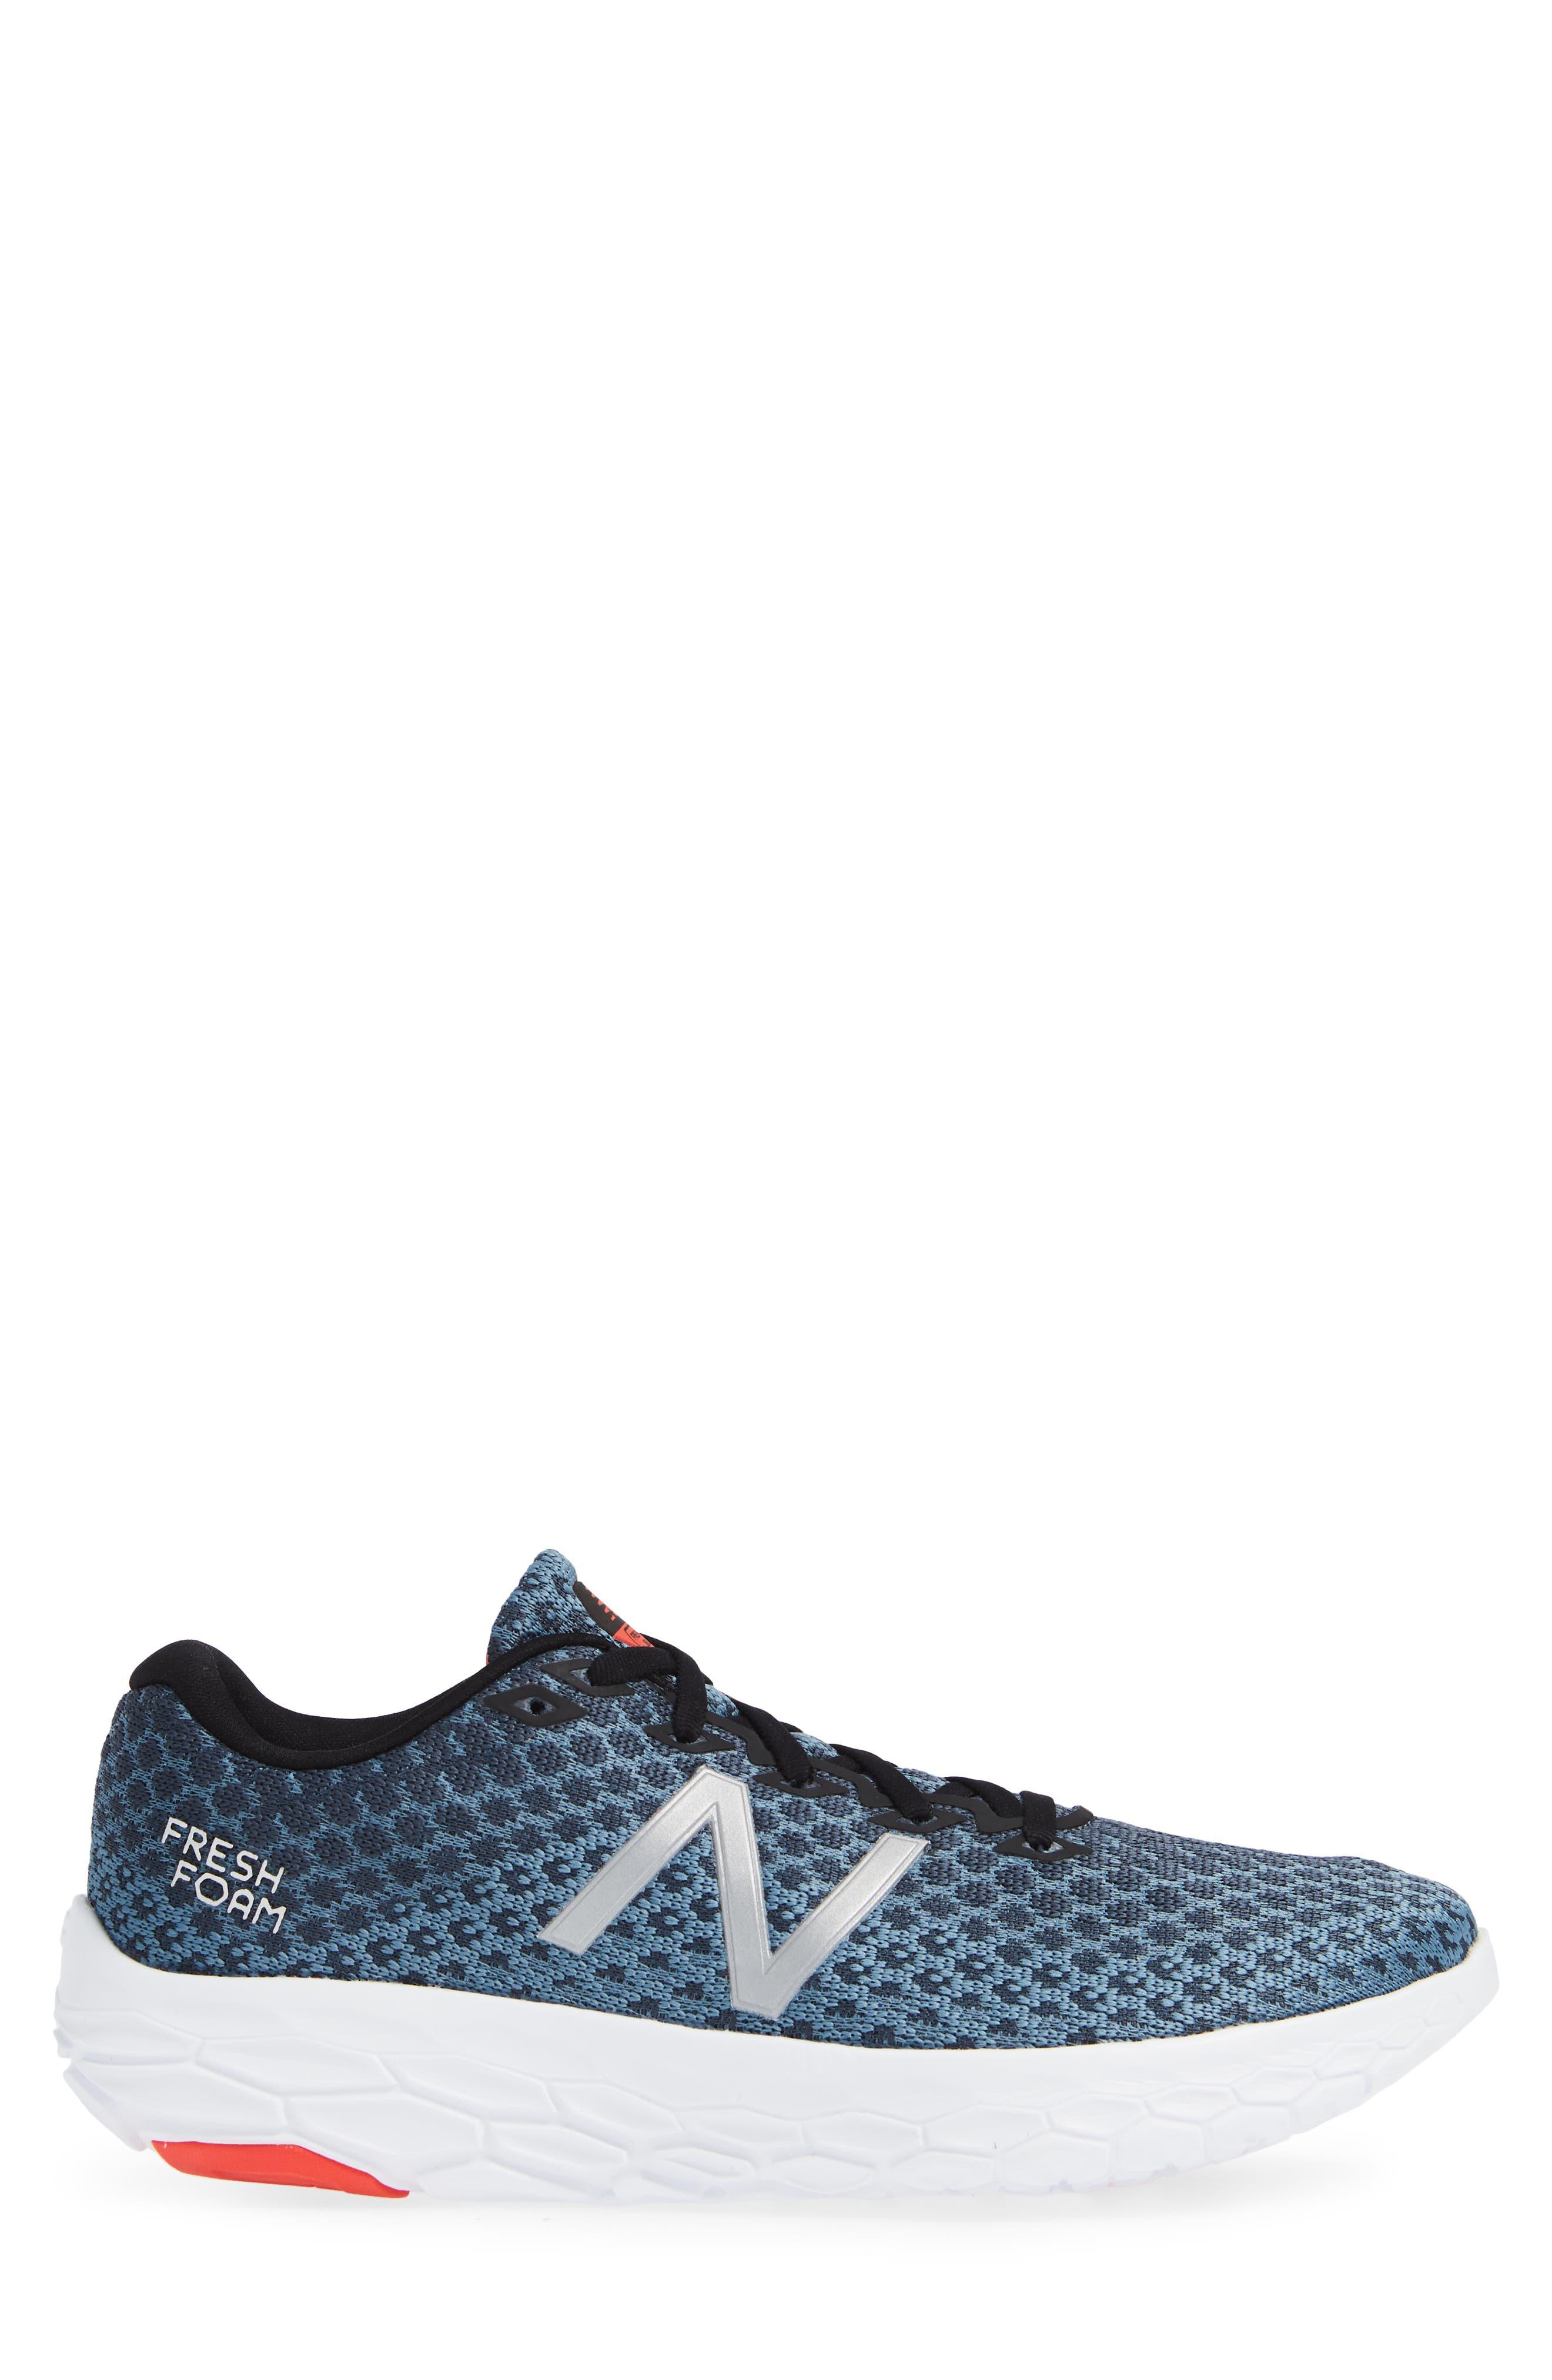 Fresh Foam Beacon Running Shoe,                             Alternate thumbnail 3, color,                             PETROL